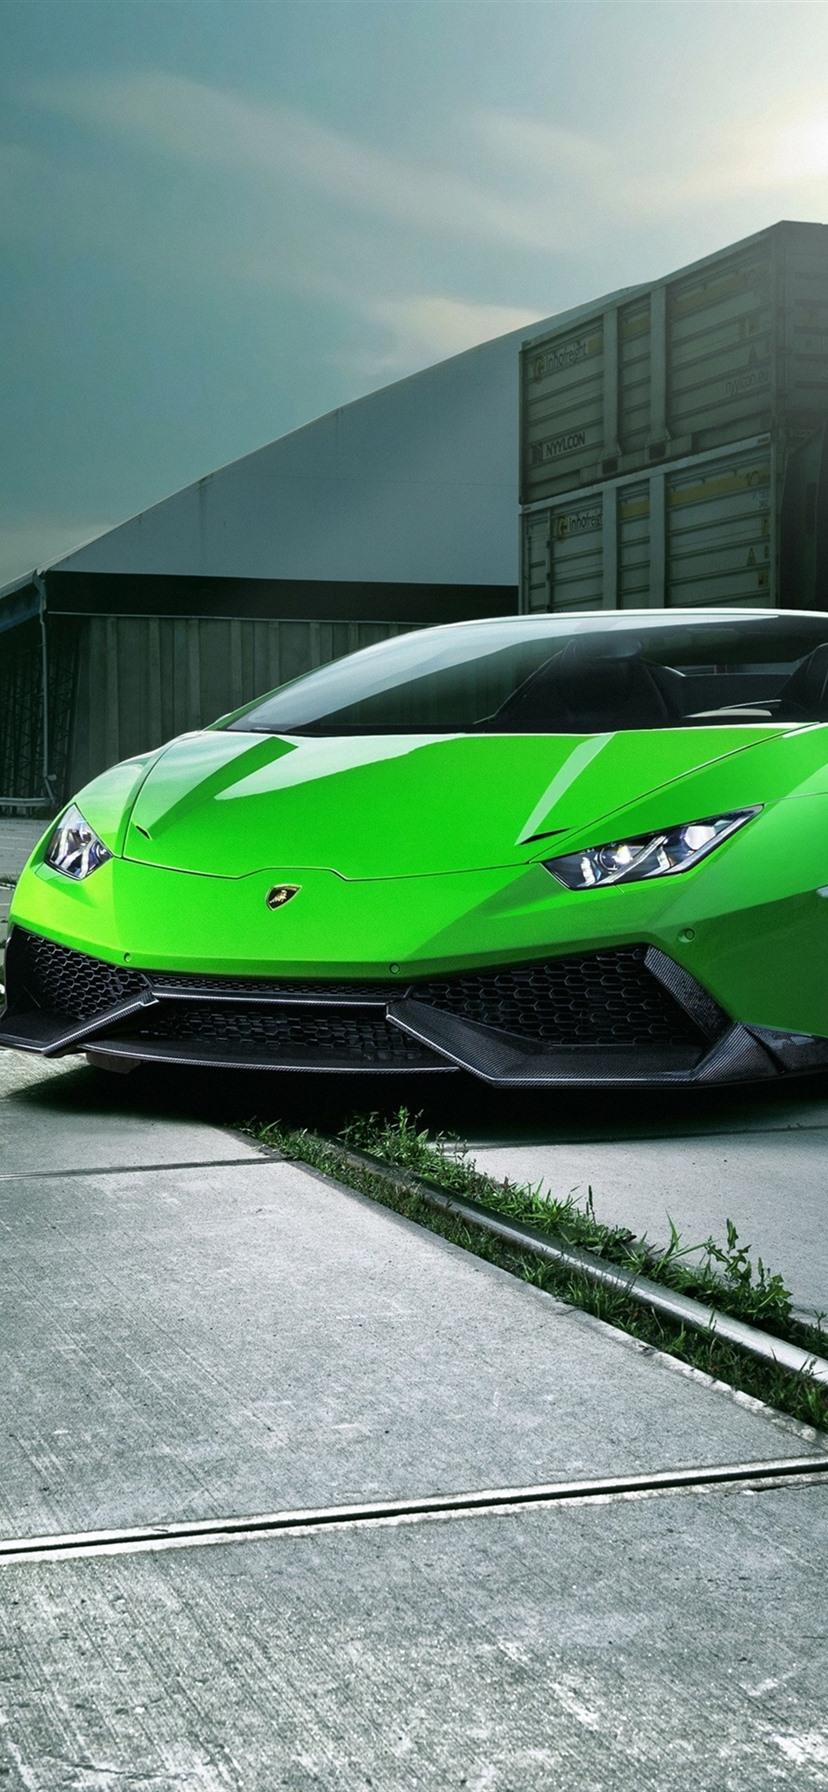 Lamborghini Huracan Spyder Green Supercar Front View Night City